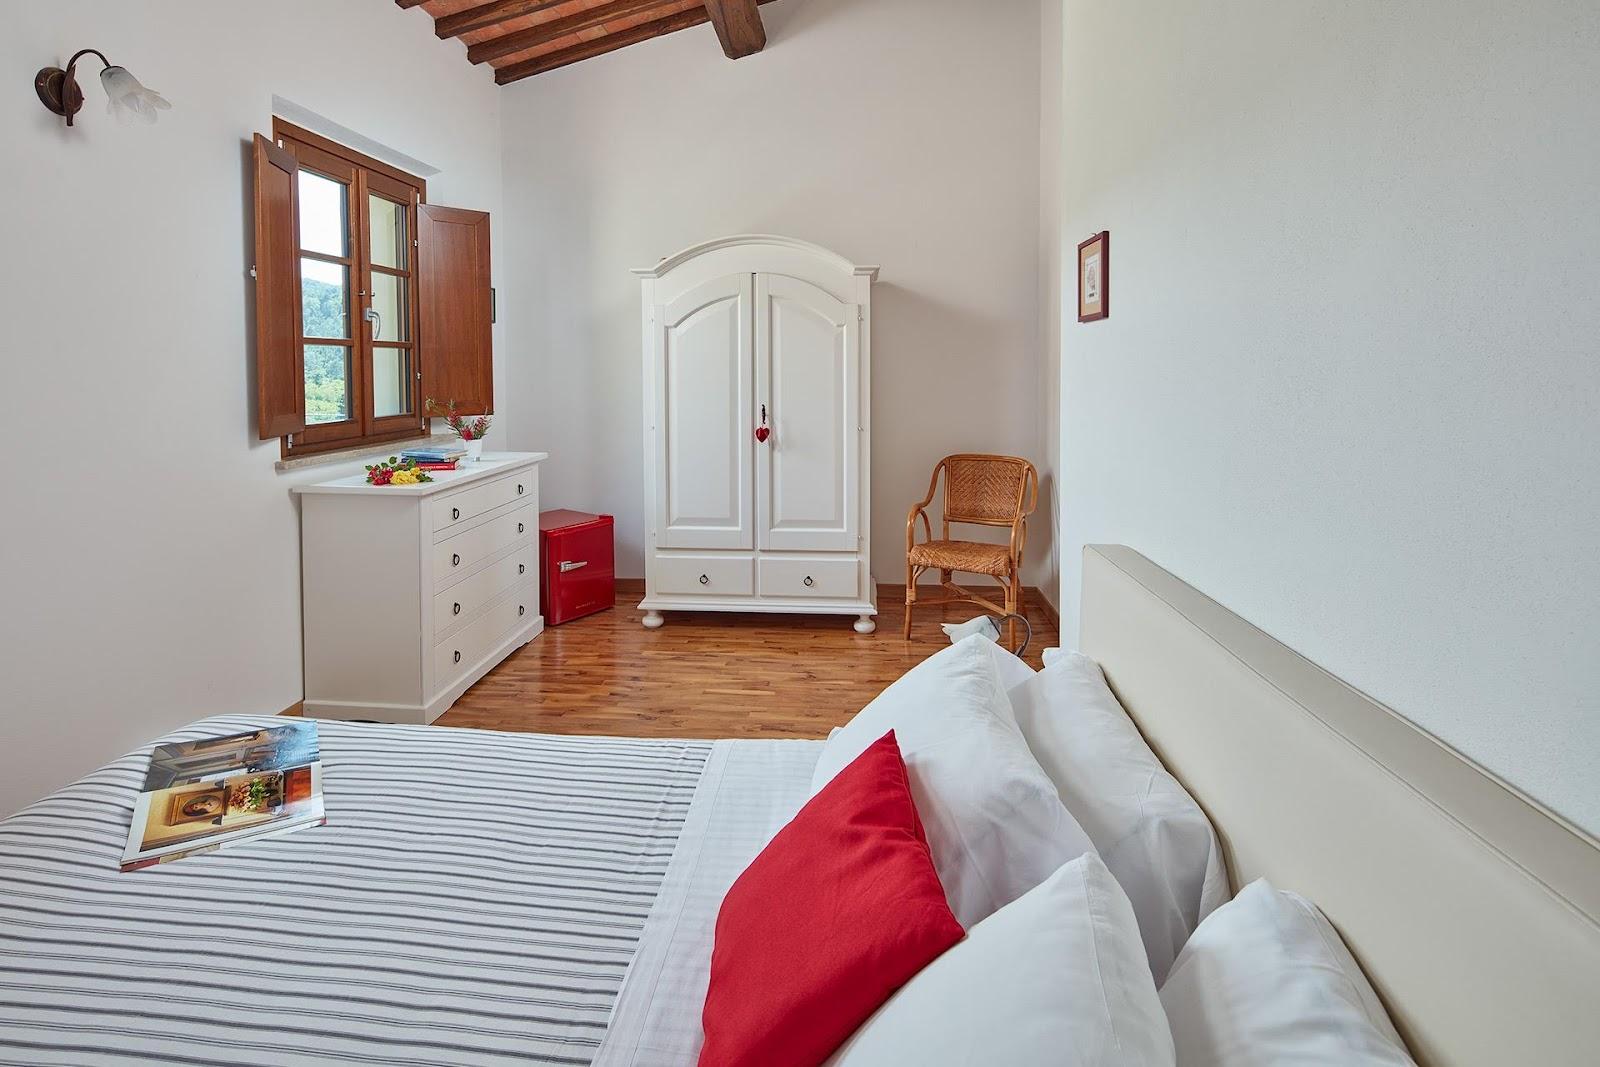 Ferienhaus Corte Paradiso (2570342), Monsummano Terme, Pistoia, Toskana, Italien, Bild 31